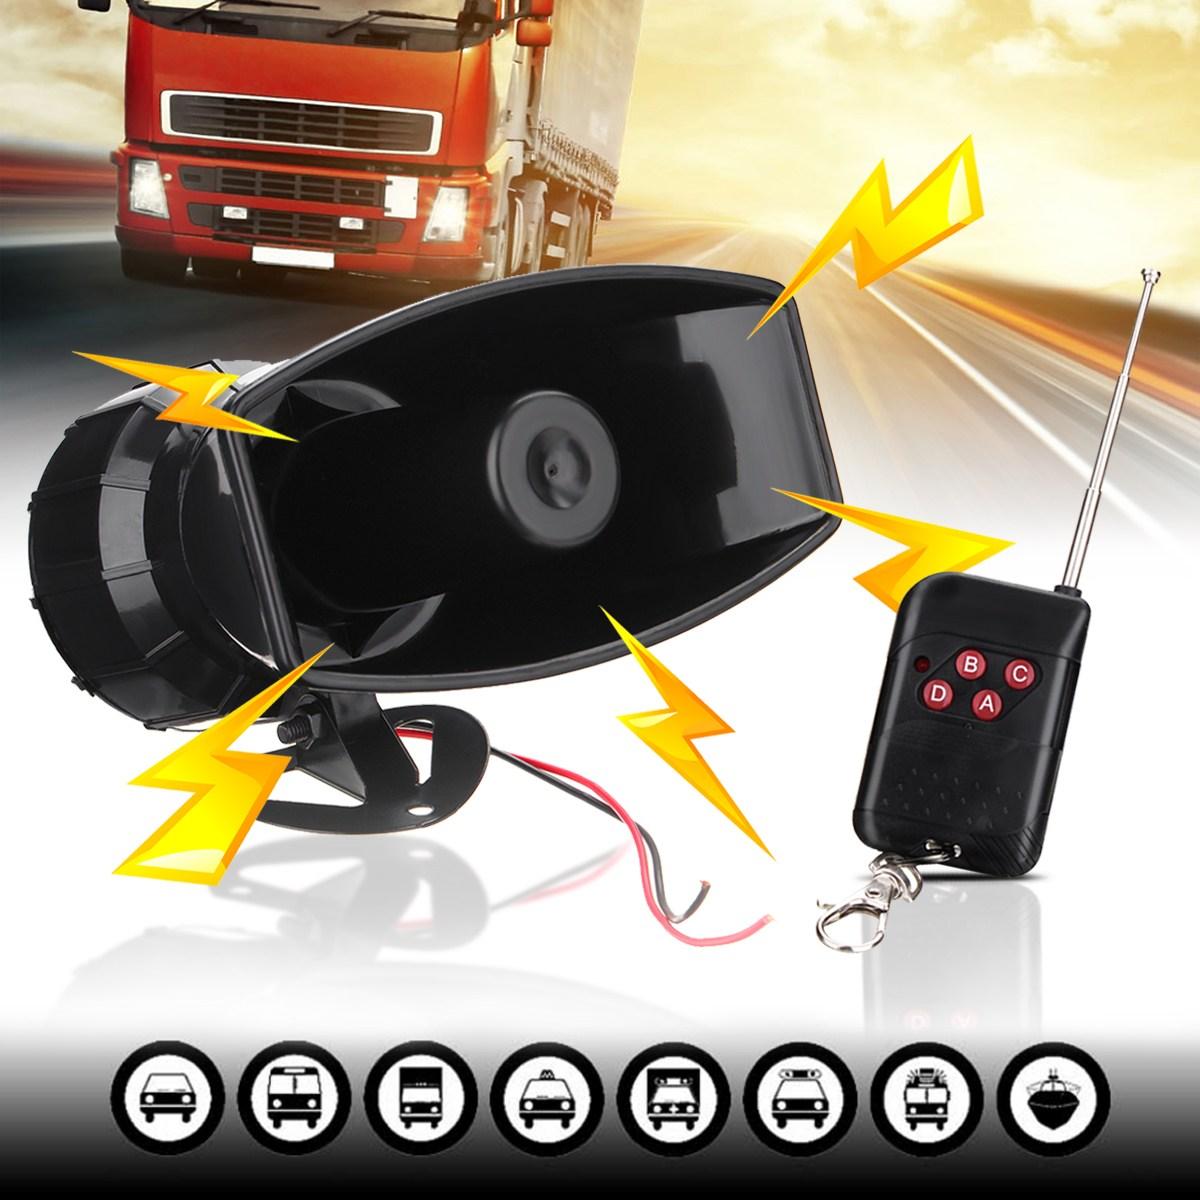 125 DB 7 Sound Loud Car Wireless Warning Alarm Horn Speaker System 12V 100W